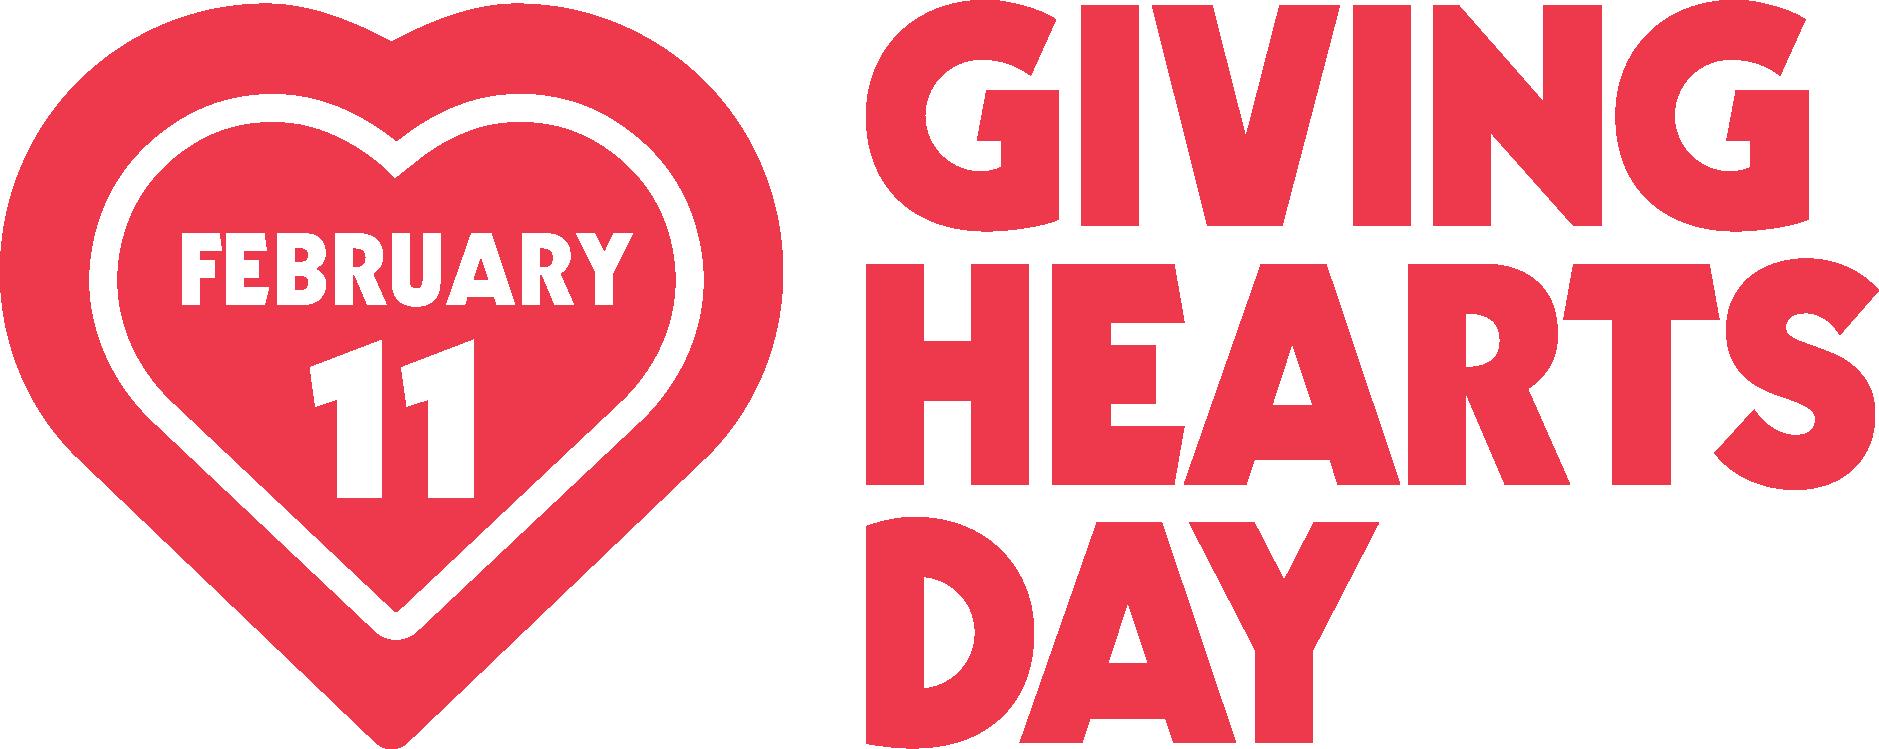 Giving Hearts Day 2021 Logo